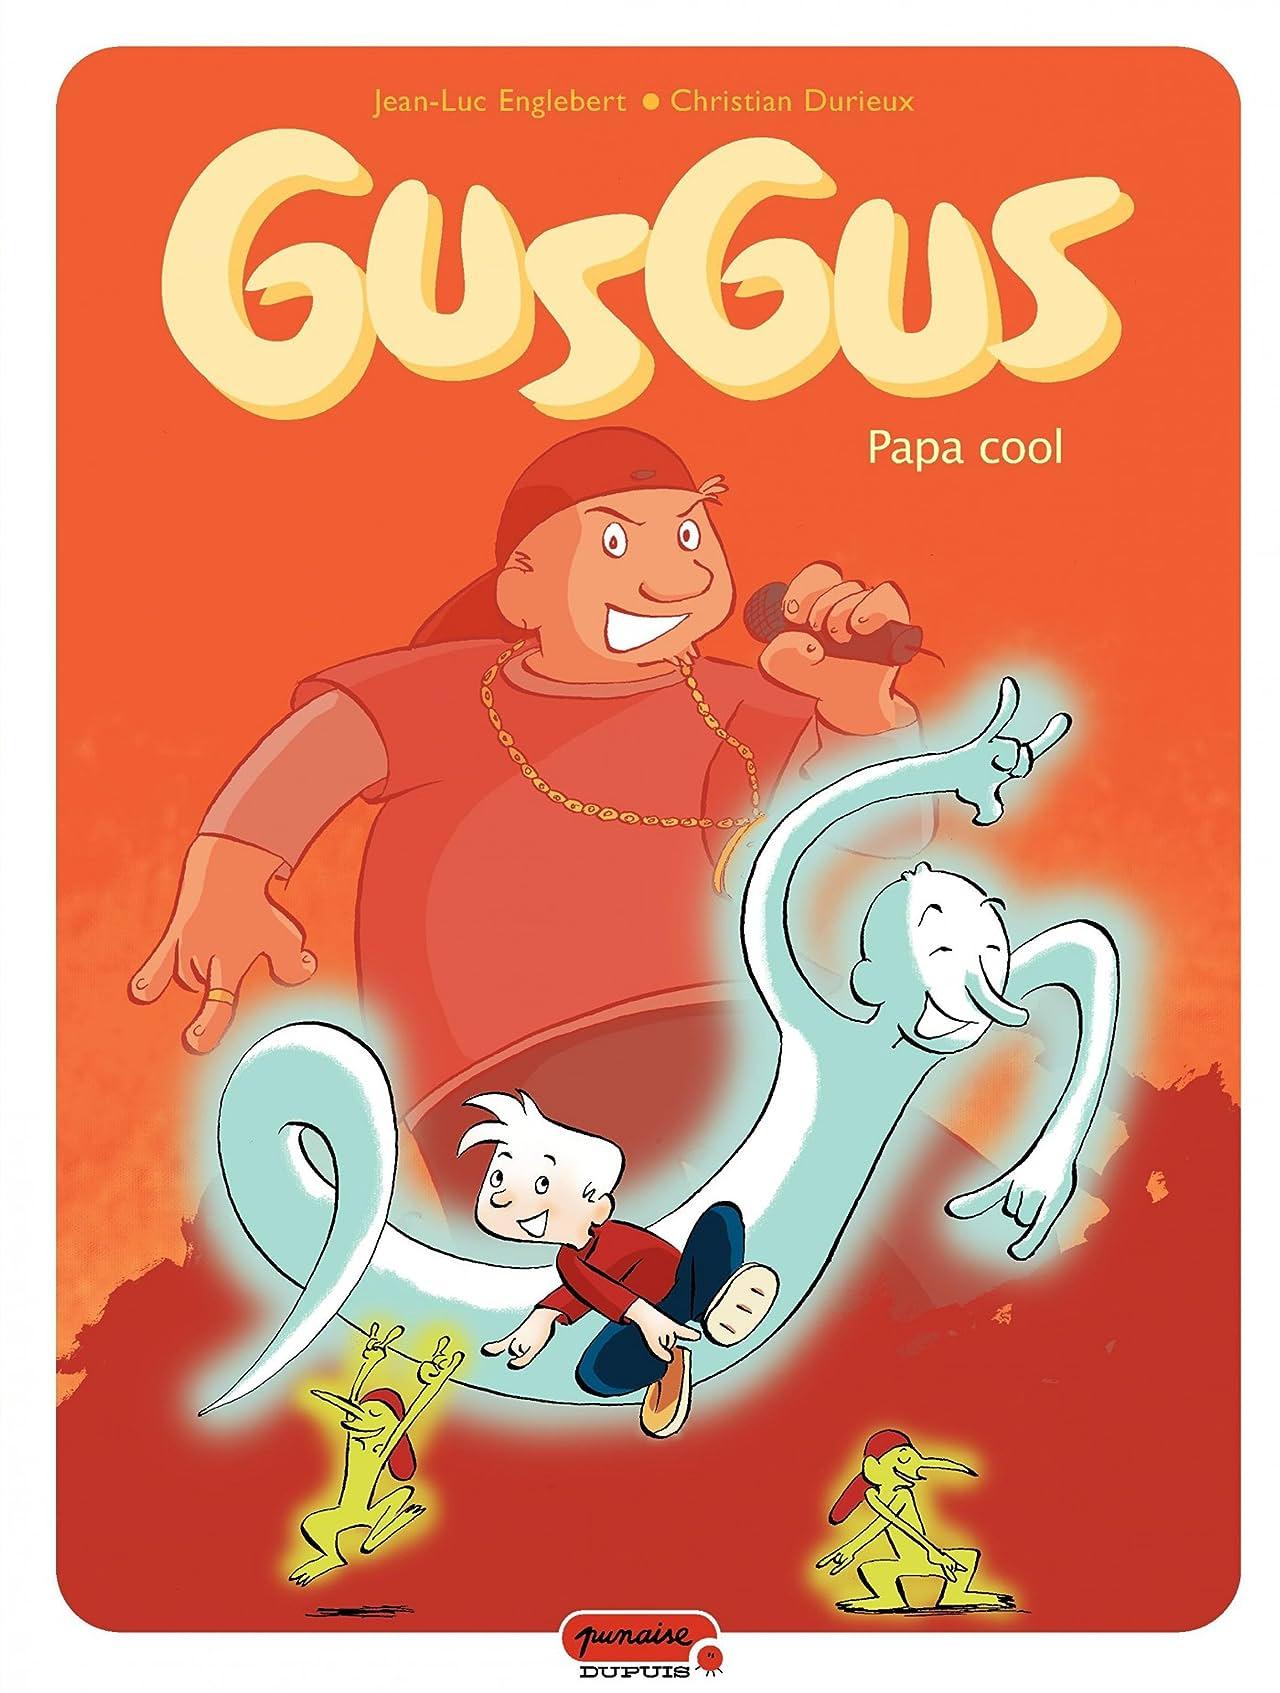 Gusgus Vol. 2: Papa cool